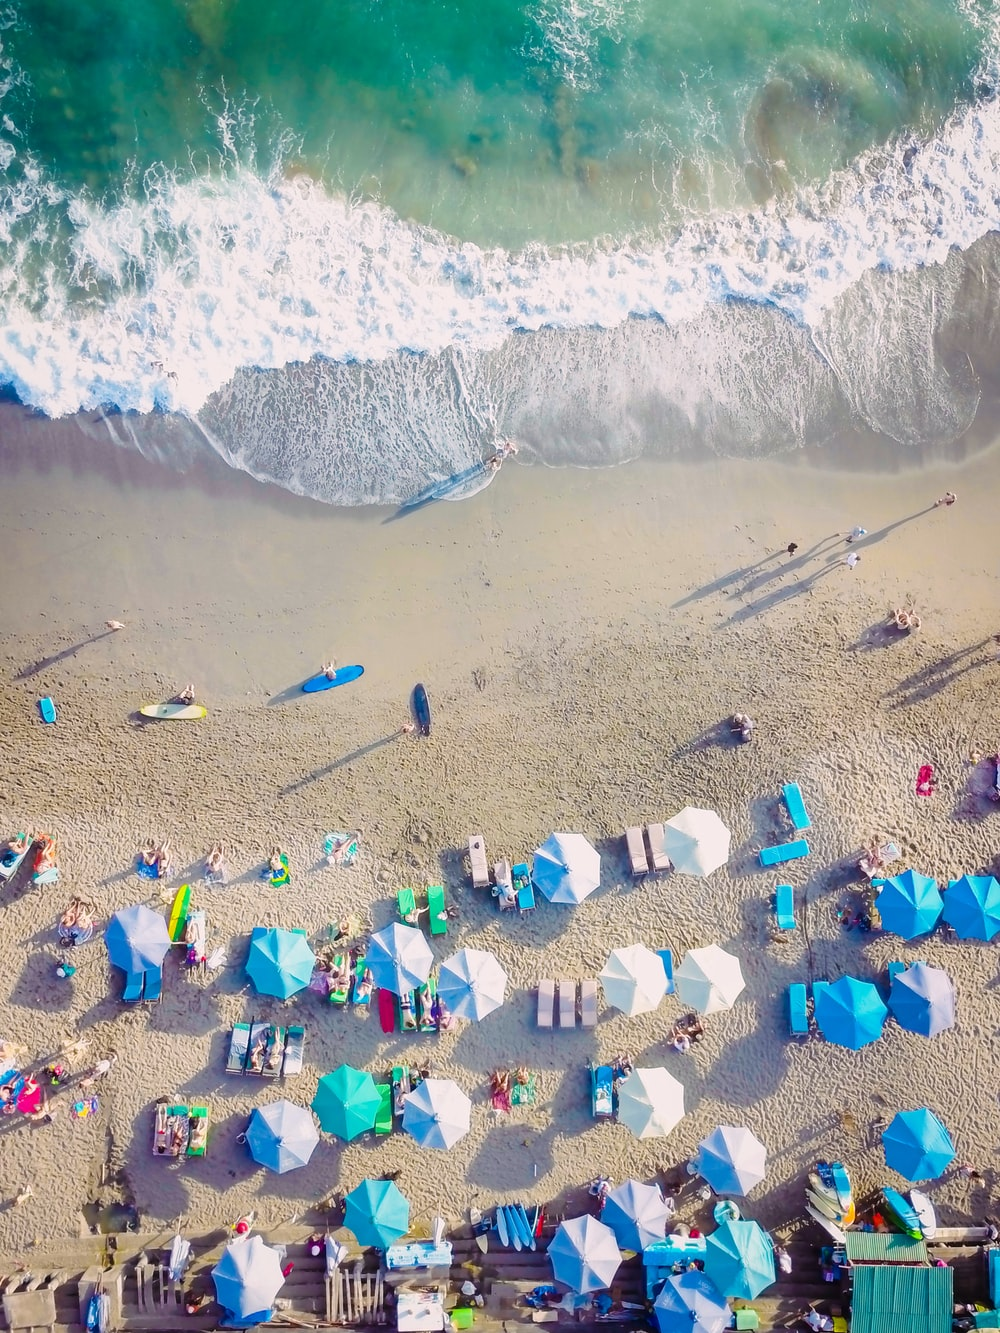 bird's eye view photo group of people lying on sea shore